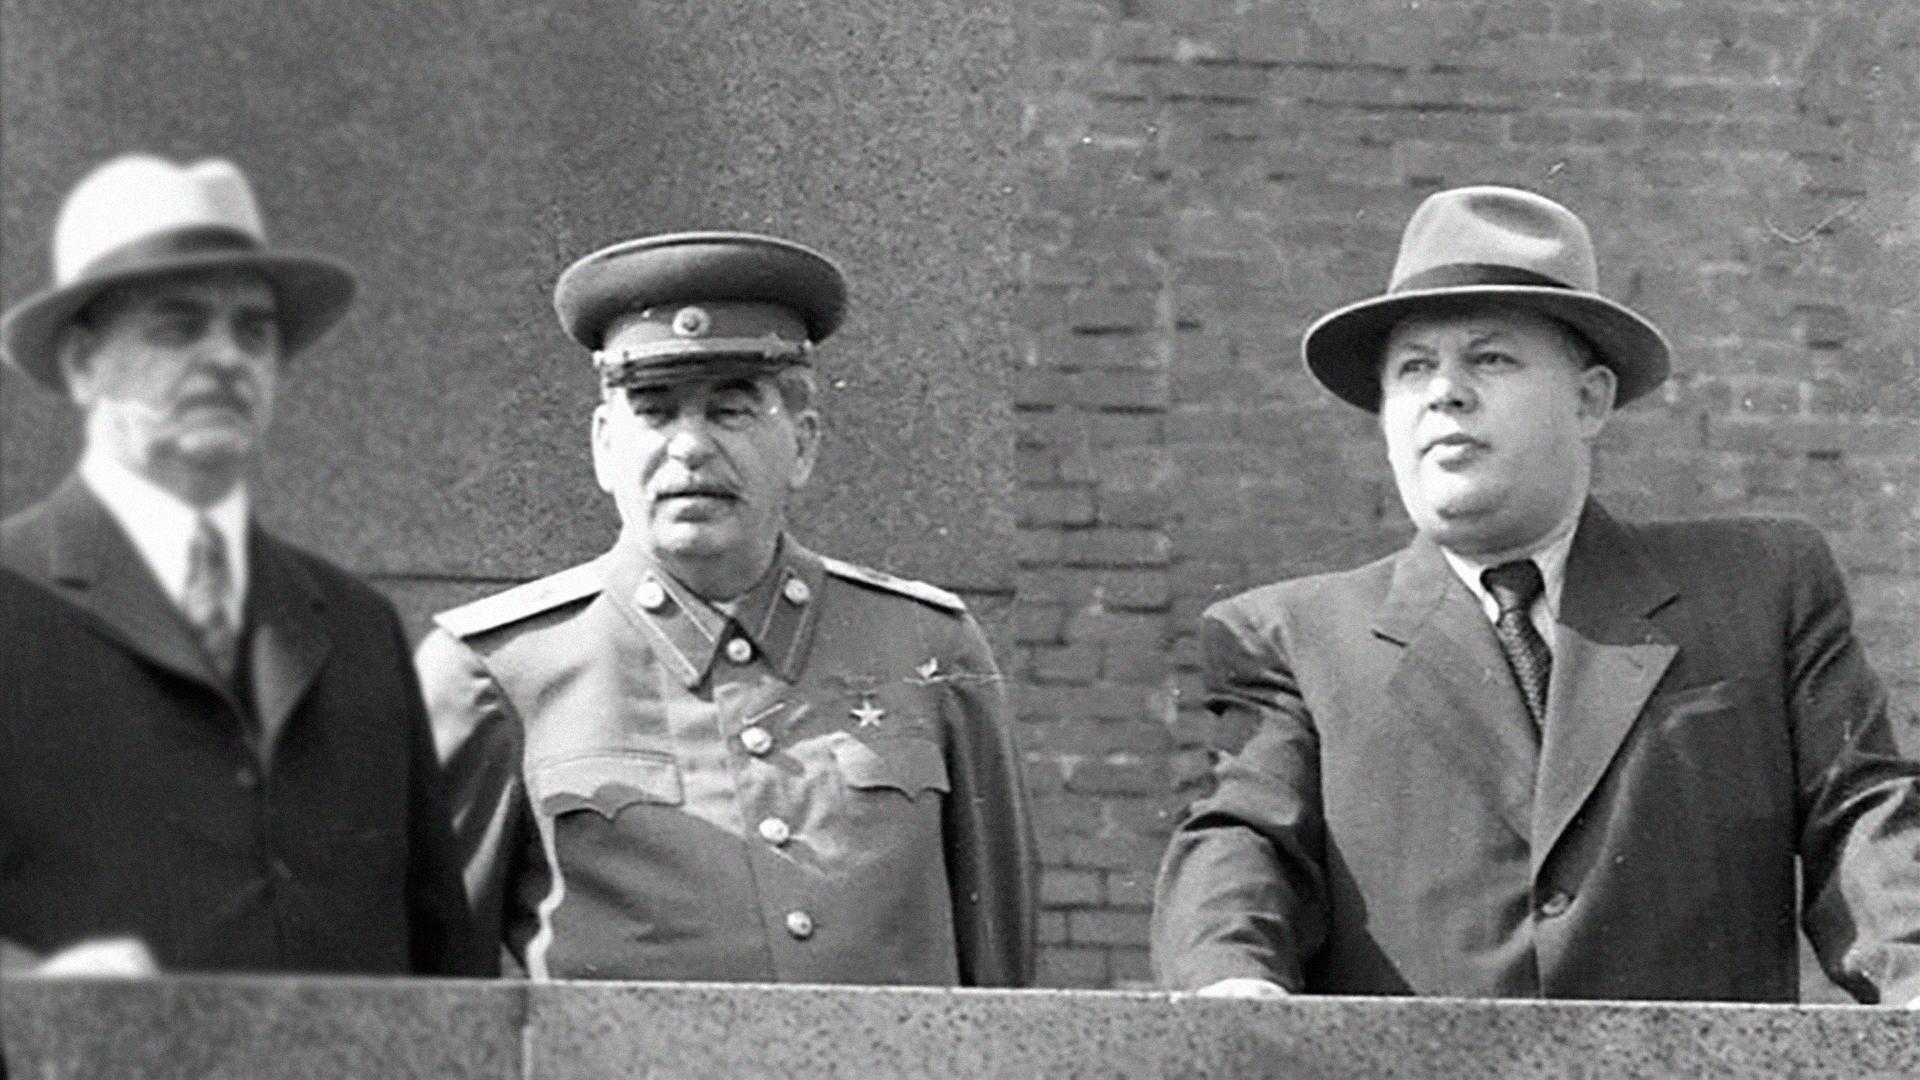 "<p>Фото © <a href=""https://russian7.ru/post/nikolay-voznesenskiy-za-chto-v-1949-godu-ra/"" target=""_blank"" rel=""noopener noreferrer"">Русская семерка</a></p>"